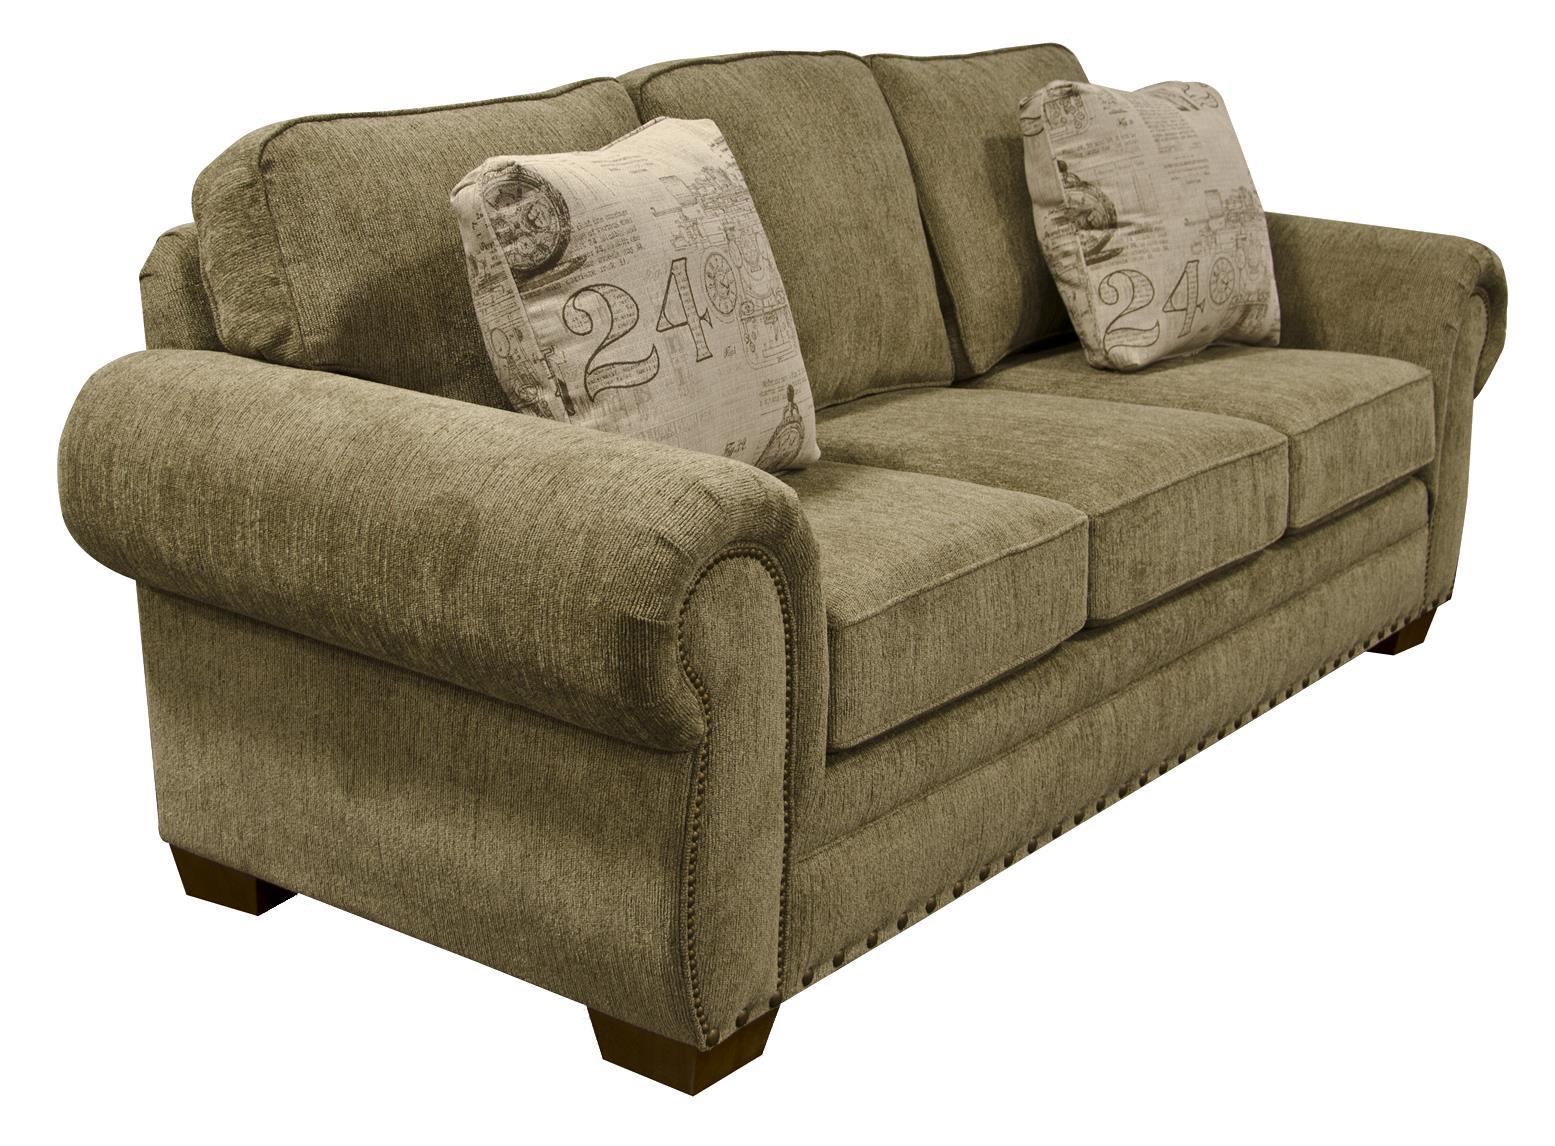 grey carleton nailhead sofa sectional sofas and sleeper england walters with trim h l stephens